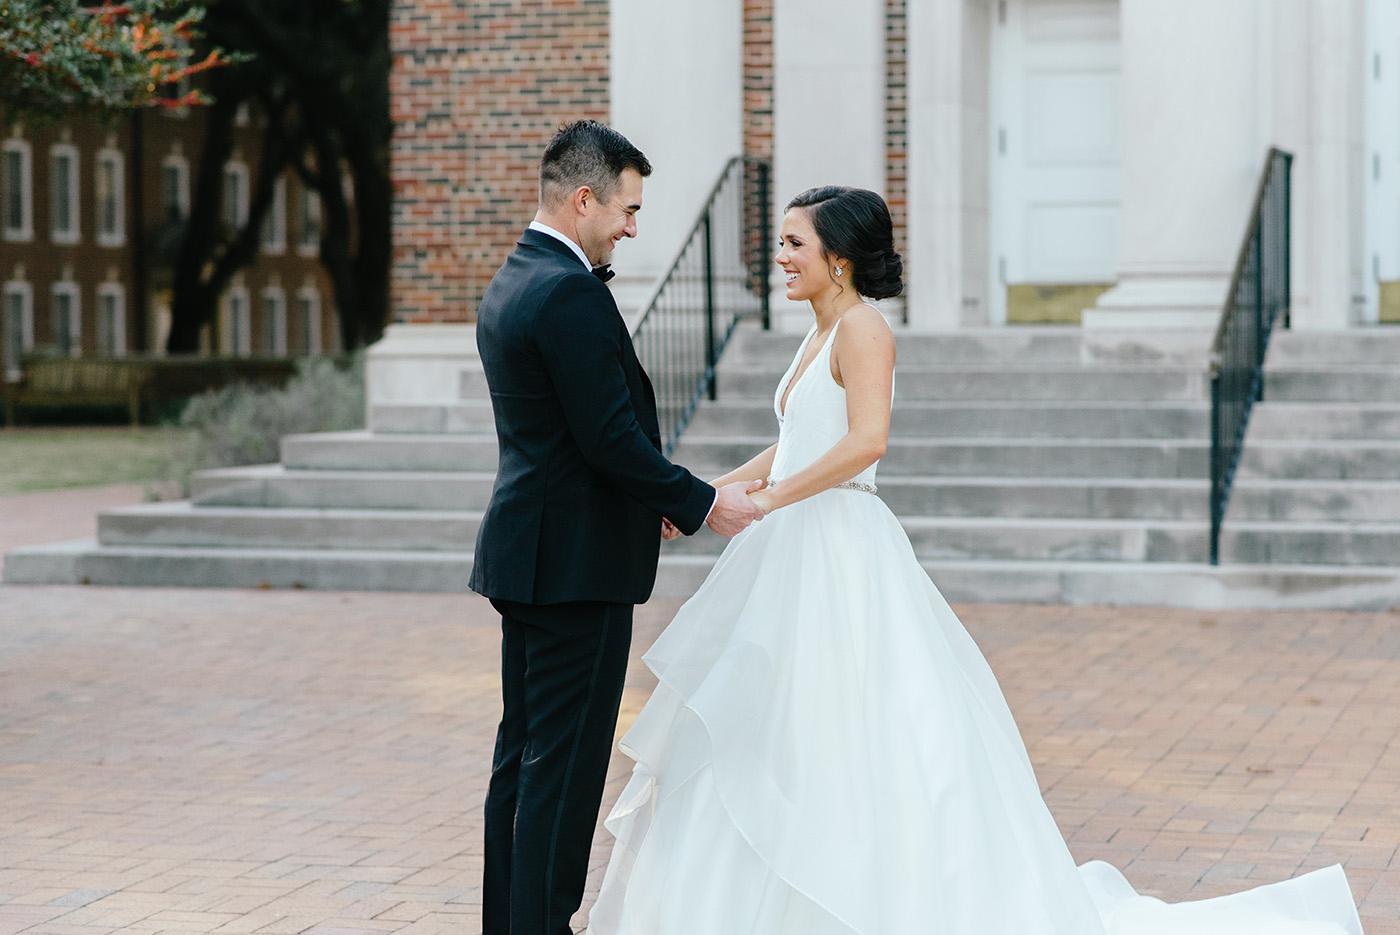 Dallas Wedding Planner - Winter Wedding at The Room on Main - Allday Events - 123.jpg